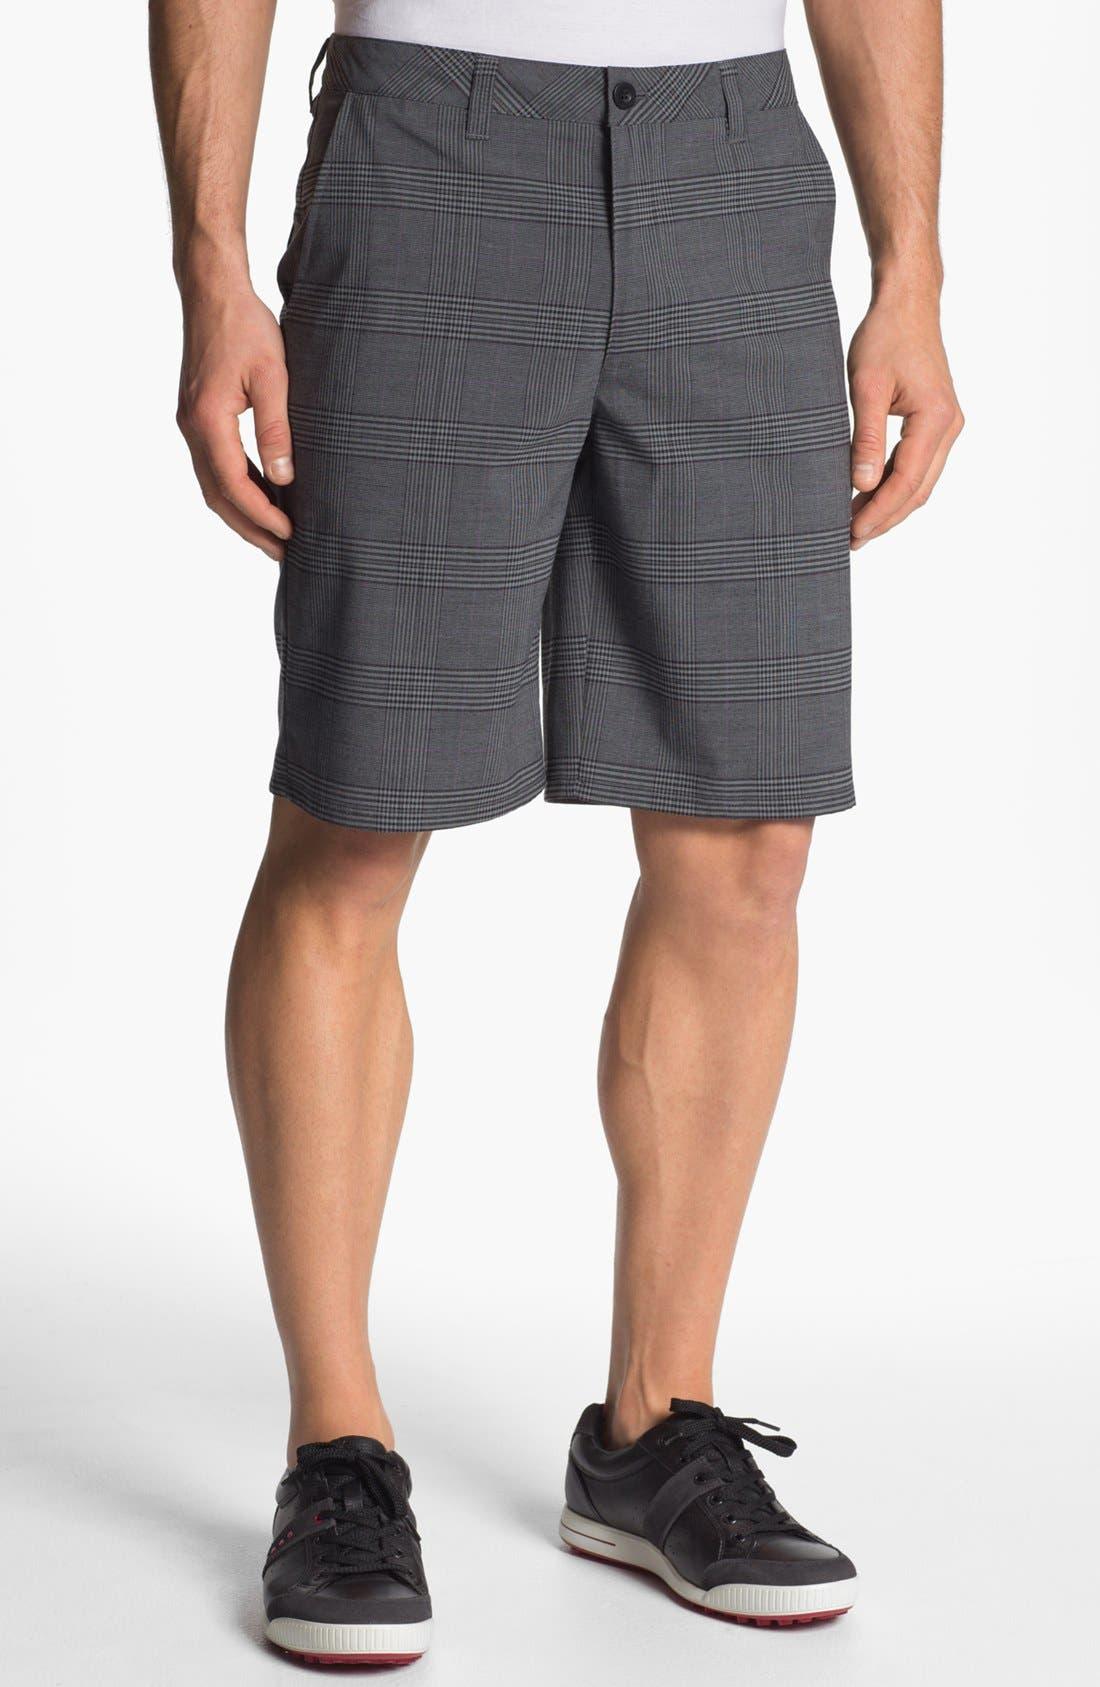 Main Image - Travis Mathew 'Consignment' Golf Shorts